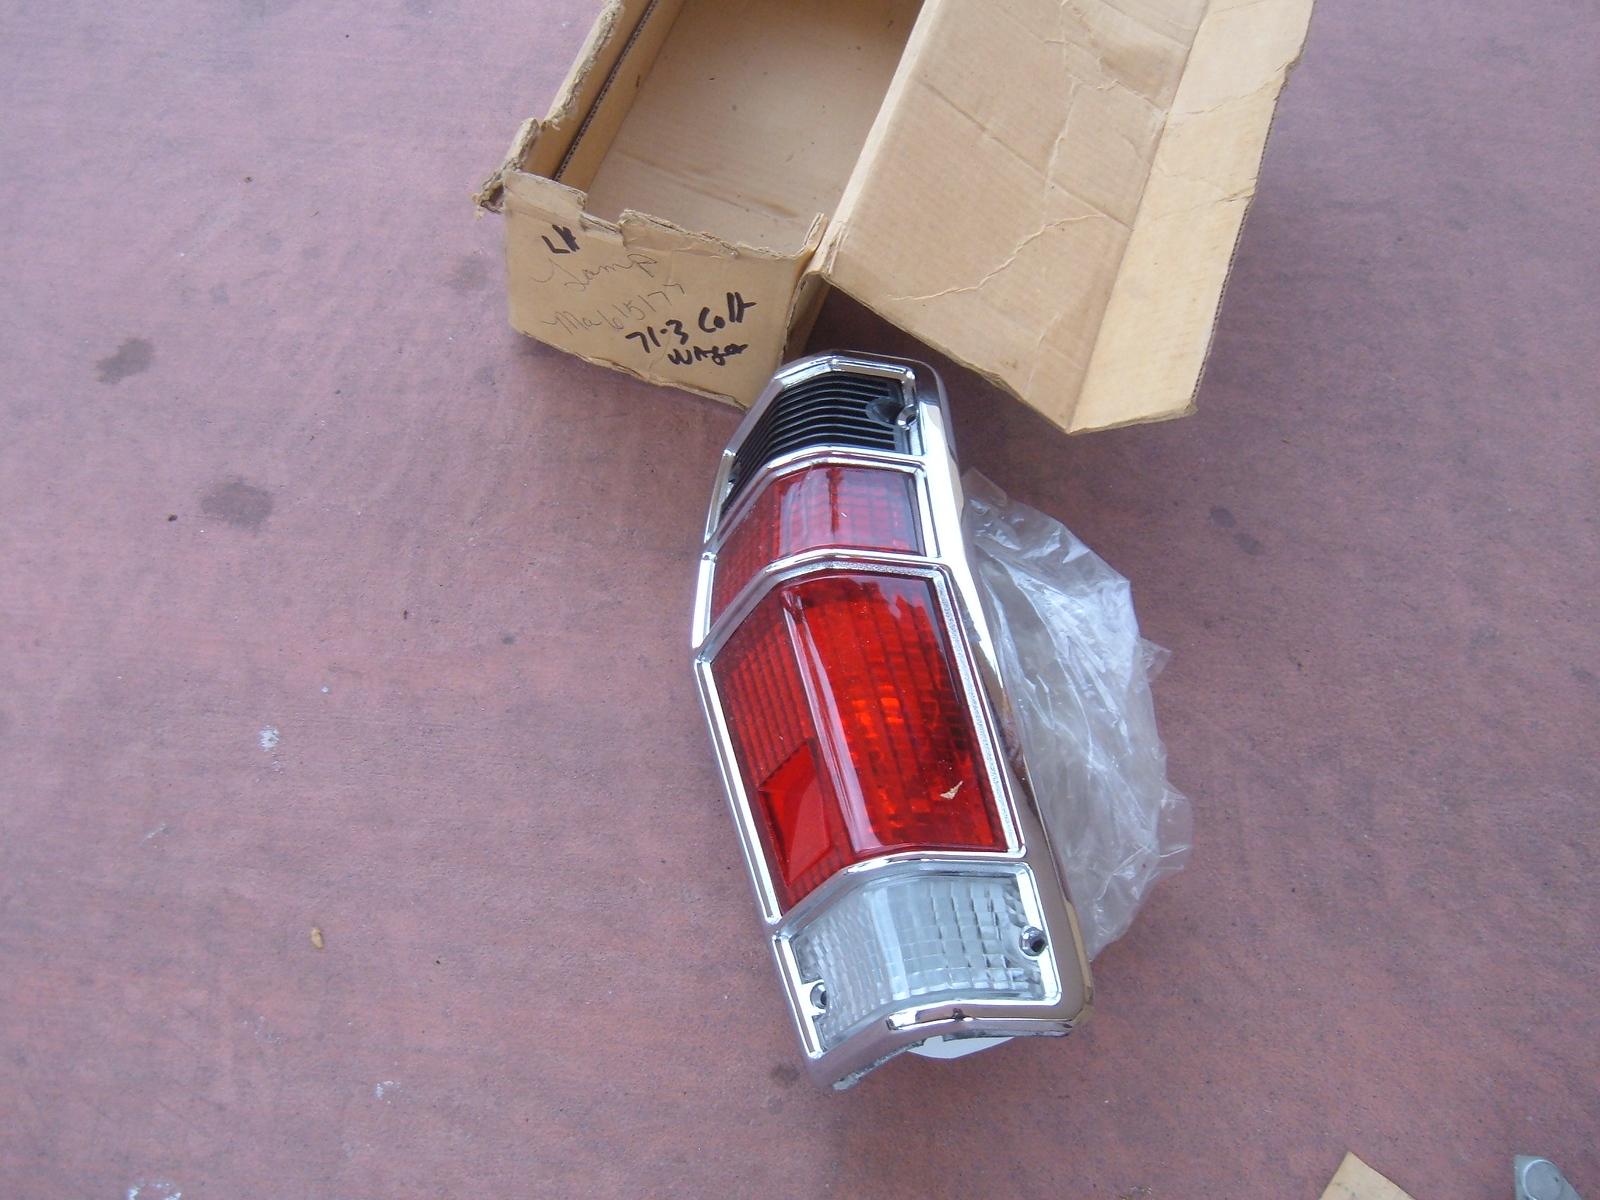 1971 72 73 dodge colt taillight assembly nos mitsubishi MA 615177 (z ma615177)